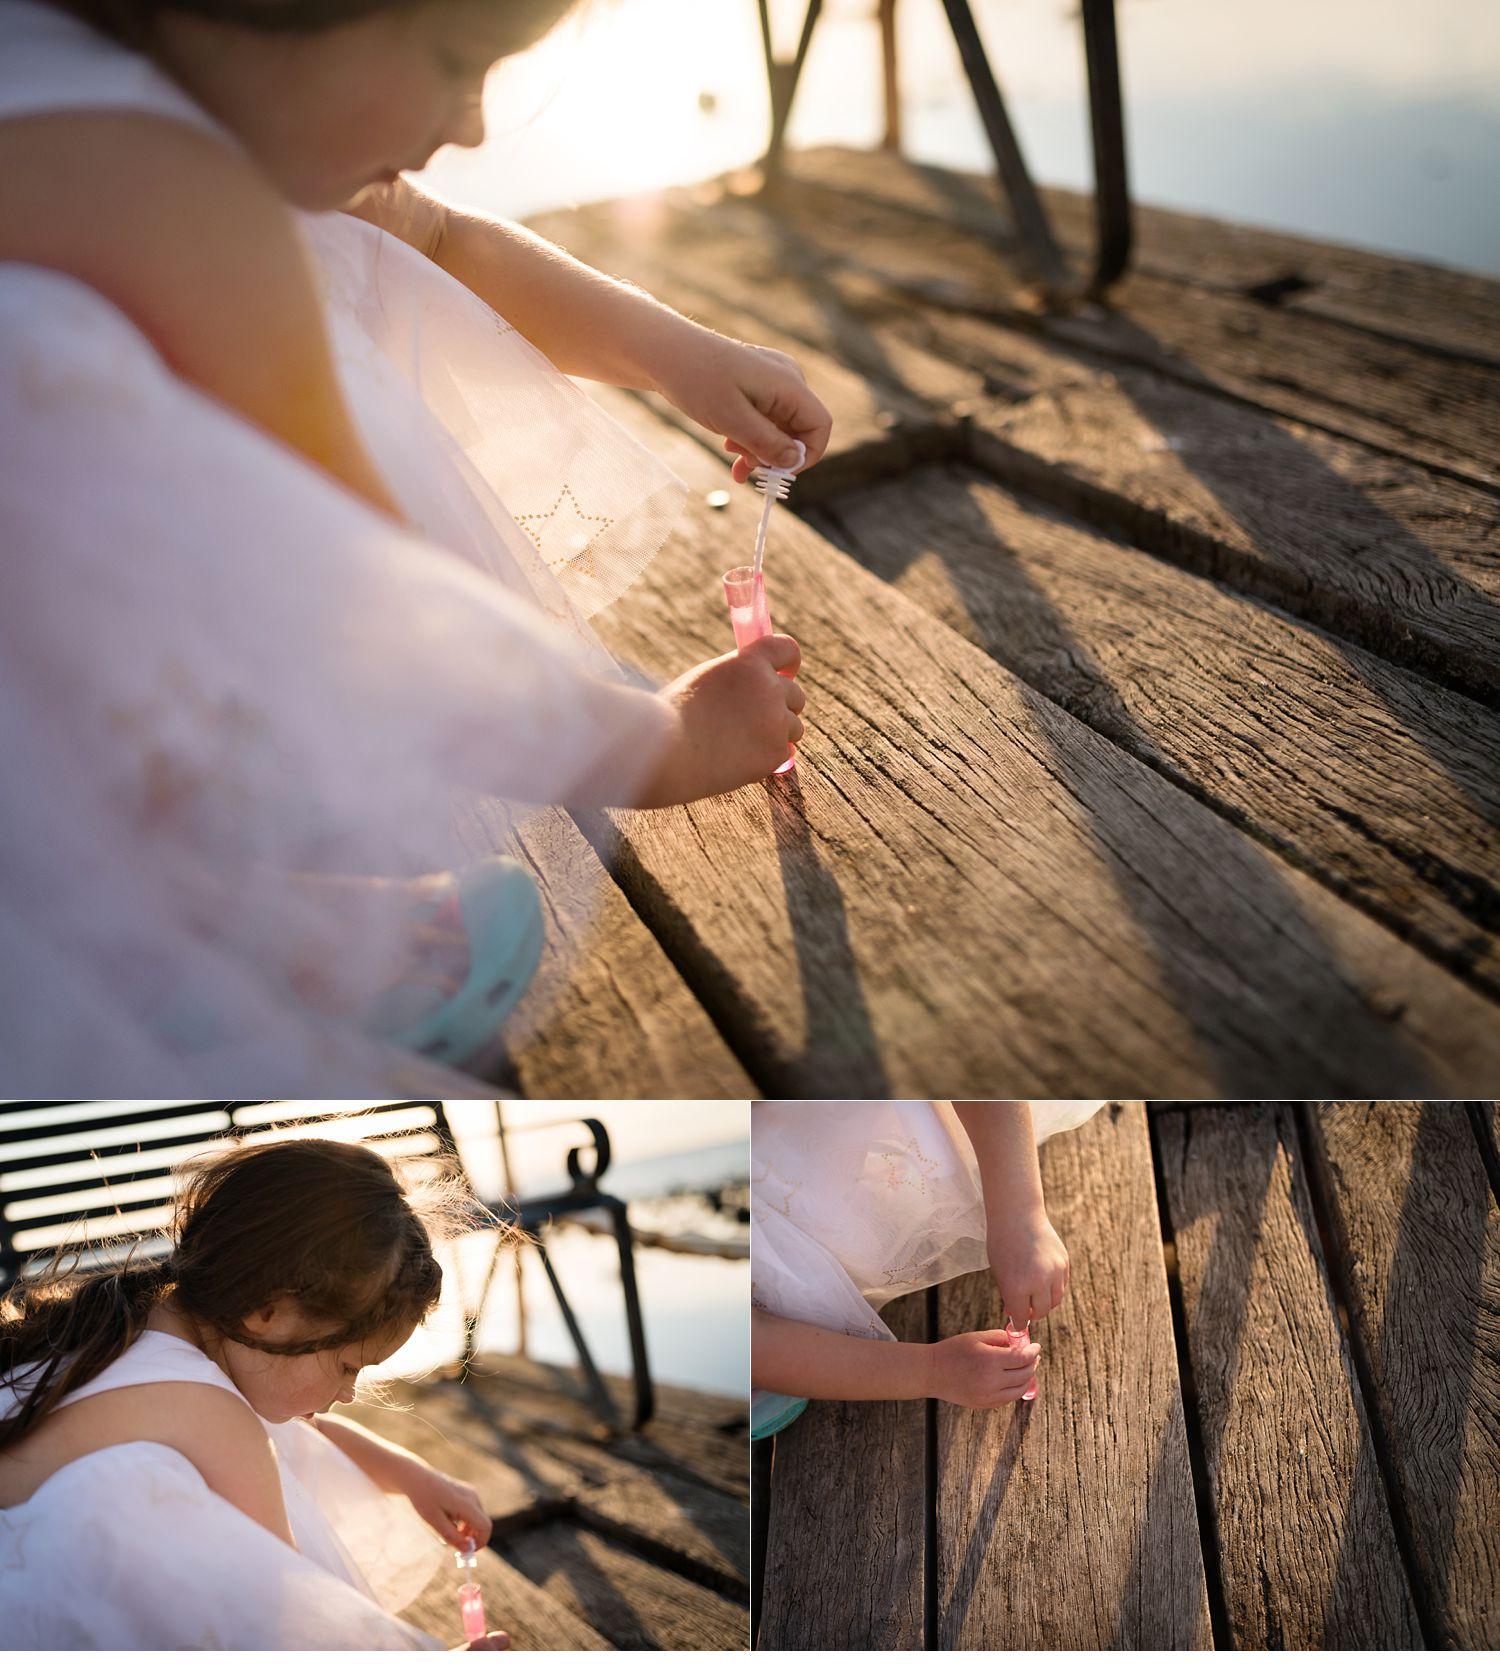 love-joy-happiness-moments-captured-melbourne-photographer.jpg